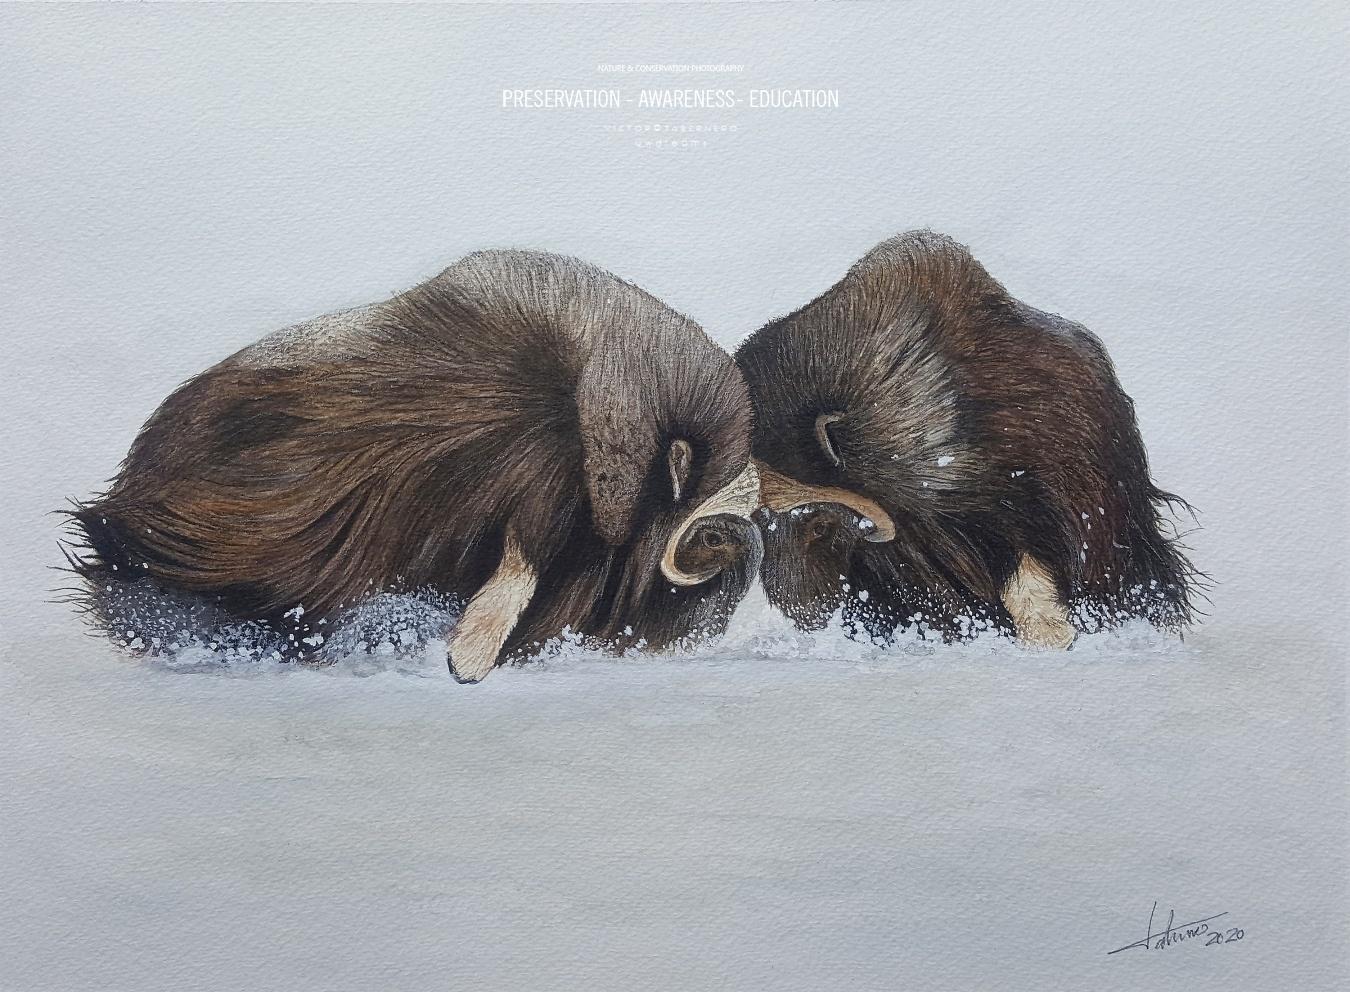 Luchas Prehistóricas 41x31cm - Vida Salvaje - Wildlife Conservation Photography, UWDREAMS.COM